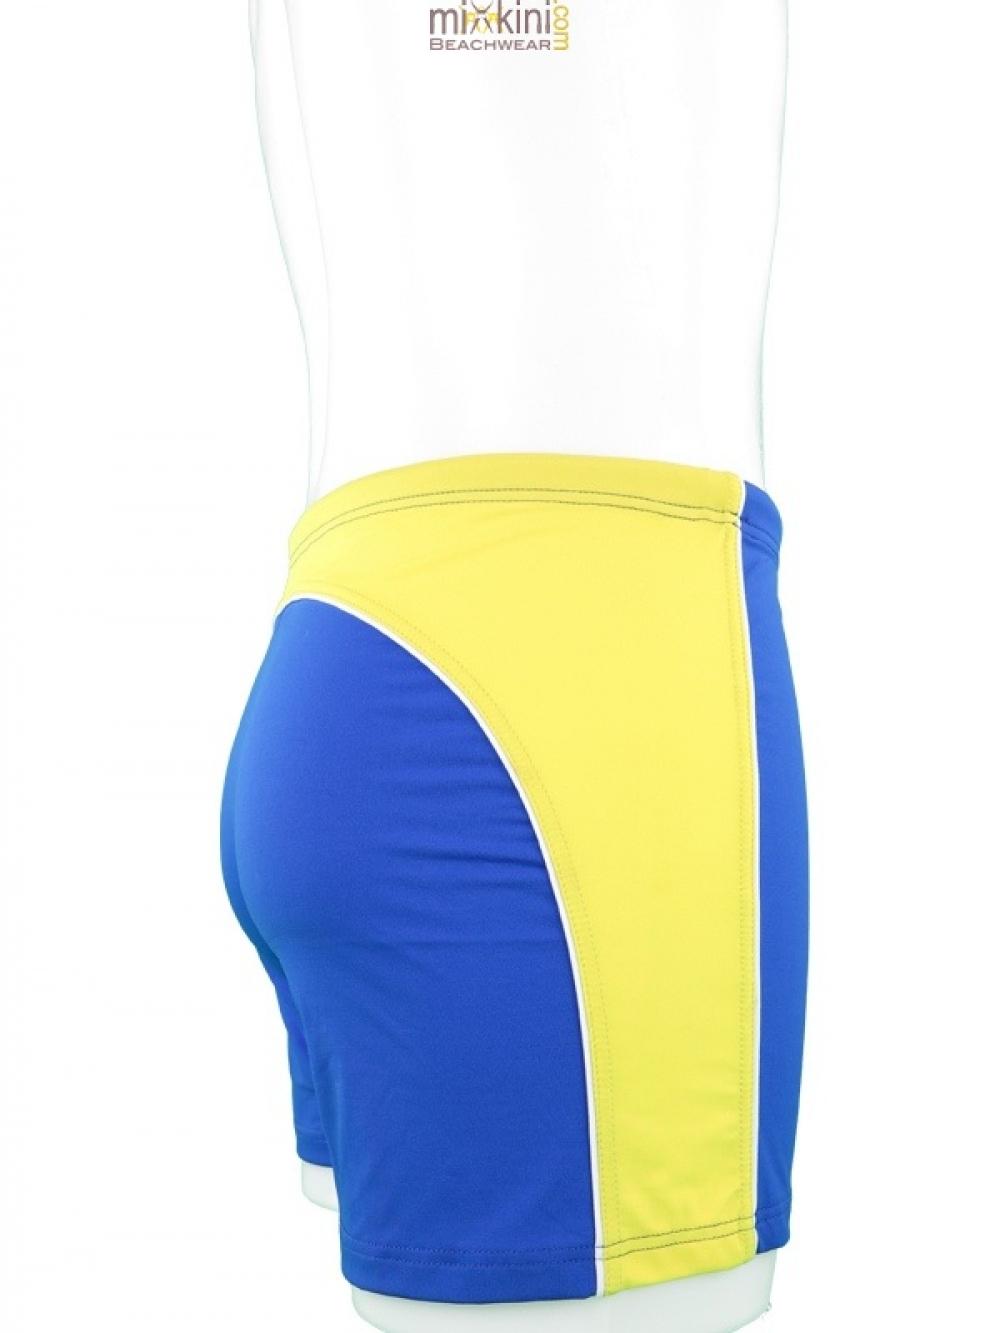 badehosen hellblau mit gelb f r m nner neu mixkini beachwear. Black Bedroom Furniture Sets. Home Design Ideas